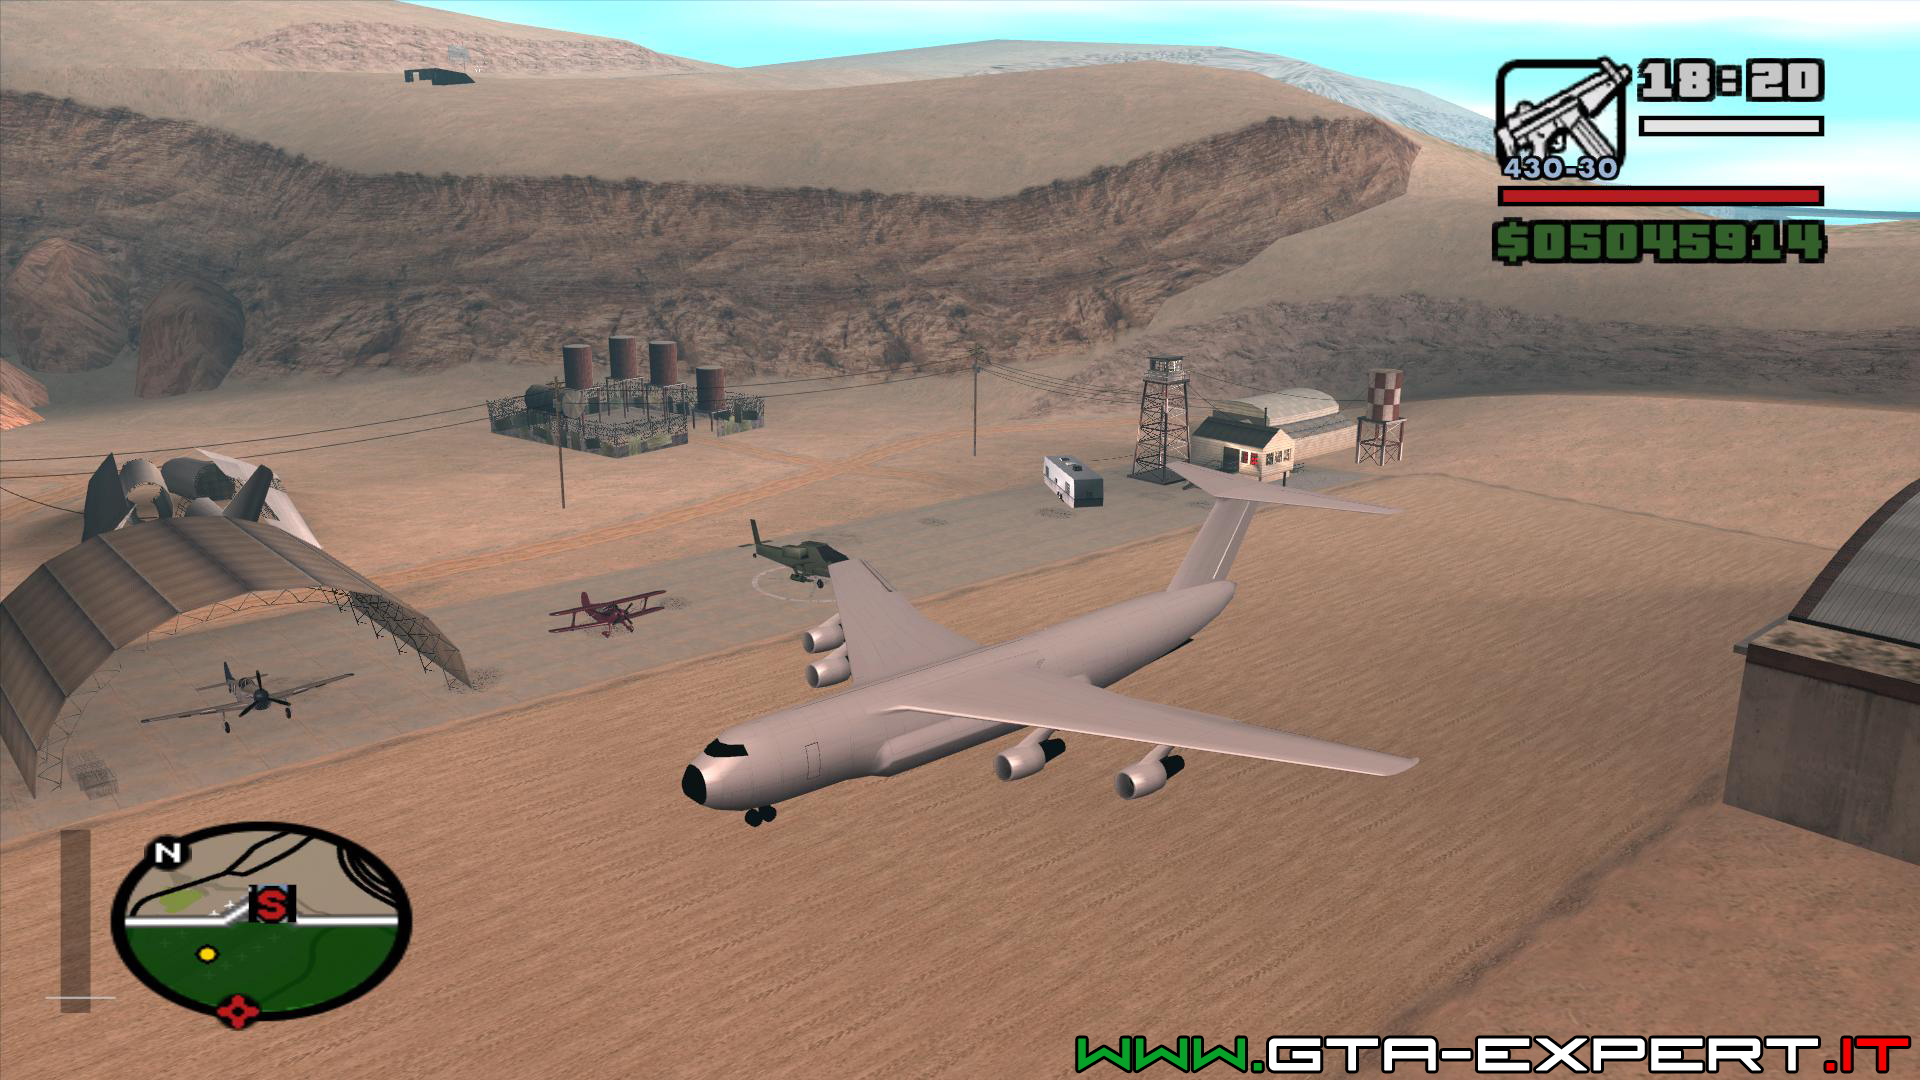 Gta V Elicottero Trucco : Elicotteri e aerei gta san andreas expert